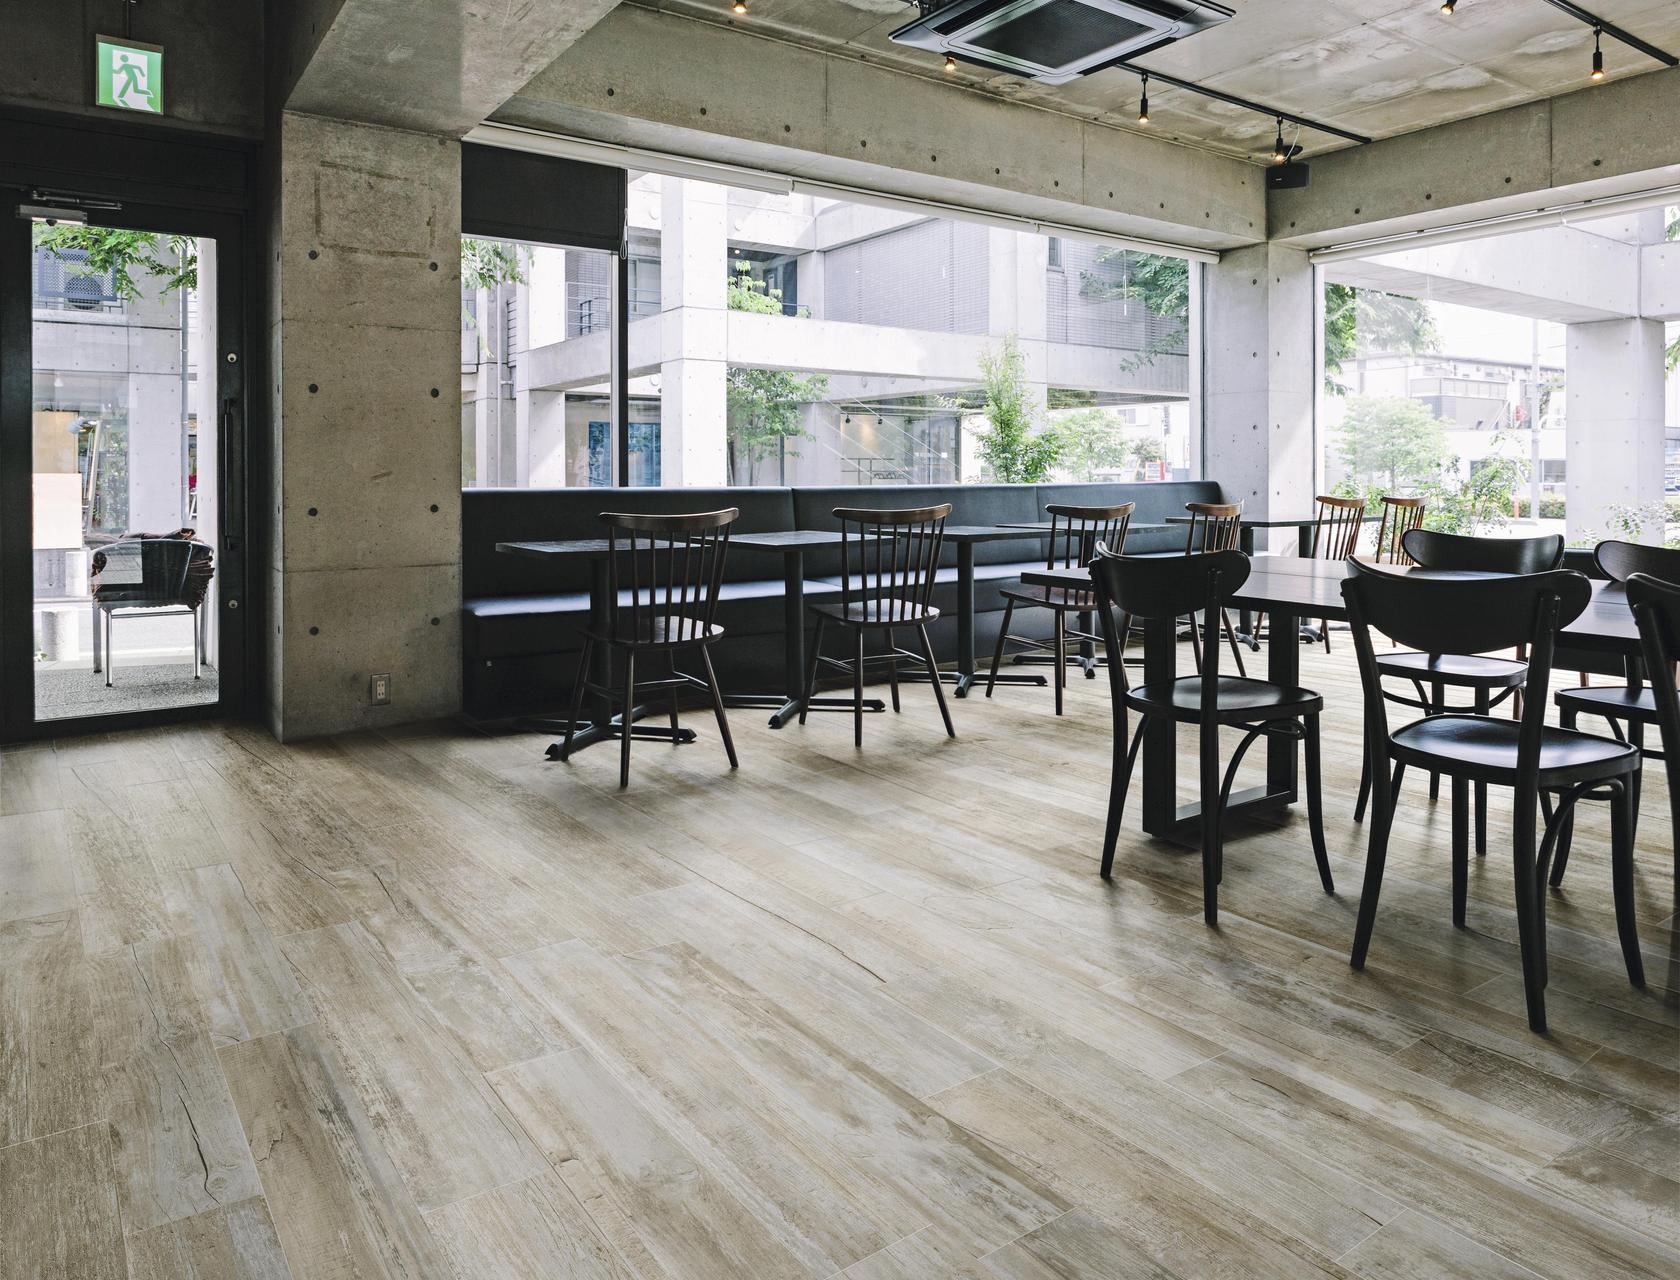 til morespoons m greige floor porcelain carrara floors tile on kitchen tiles italian polished only